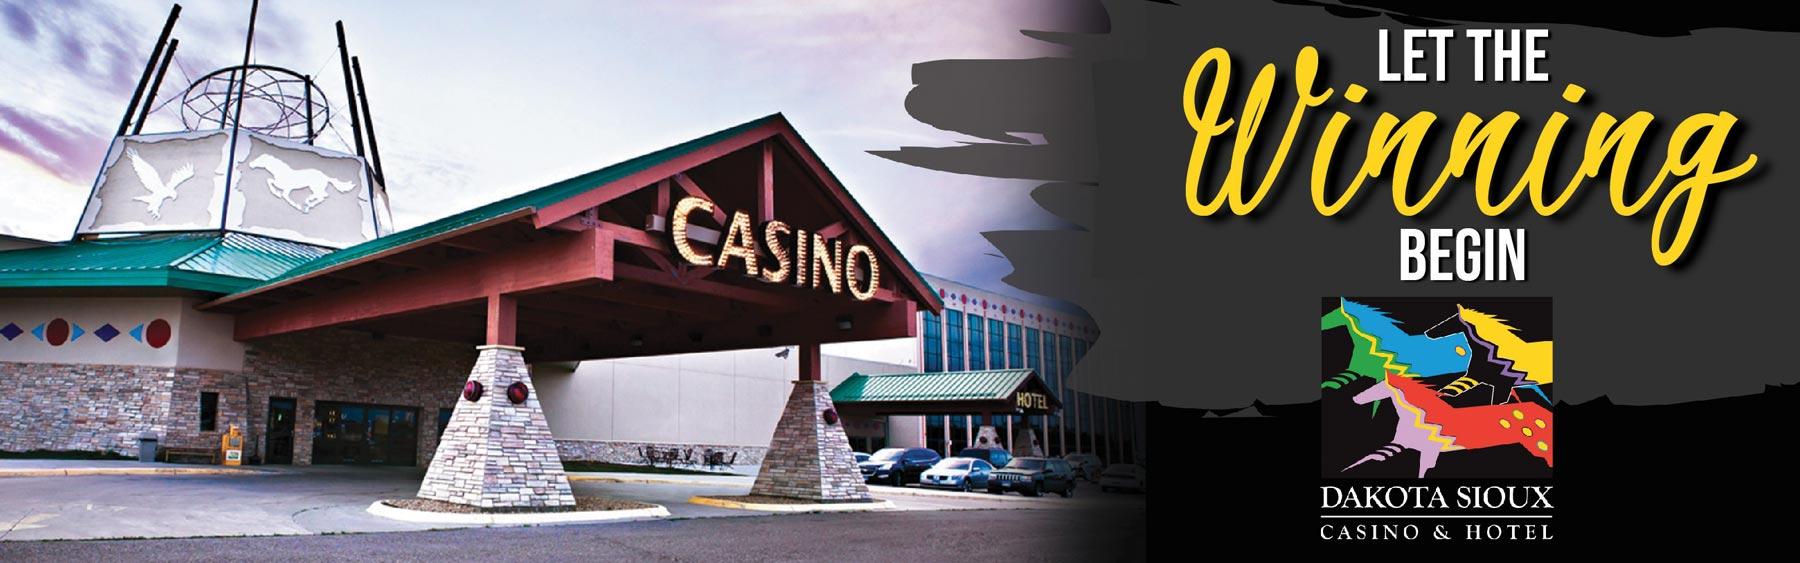 Dakota Sioux Casino entrance